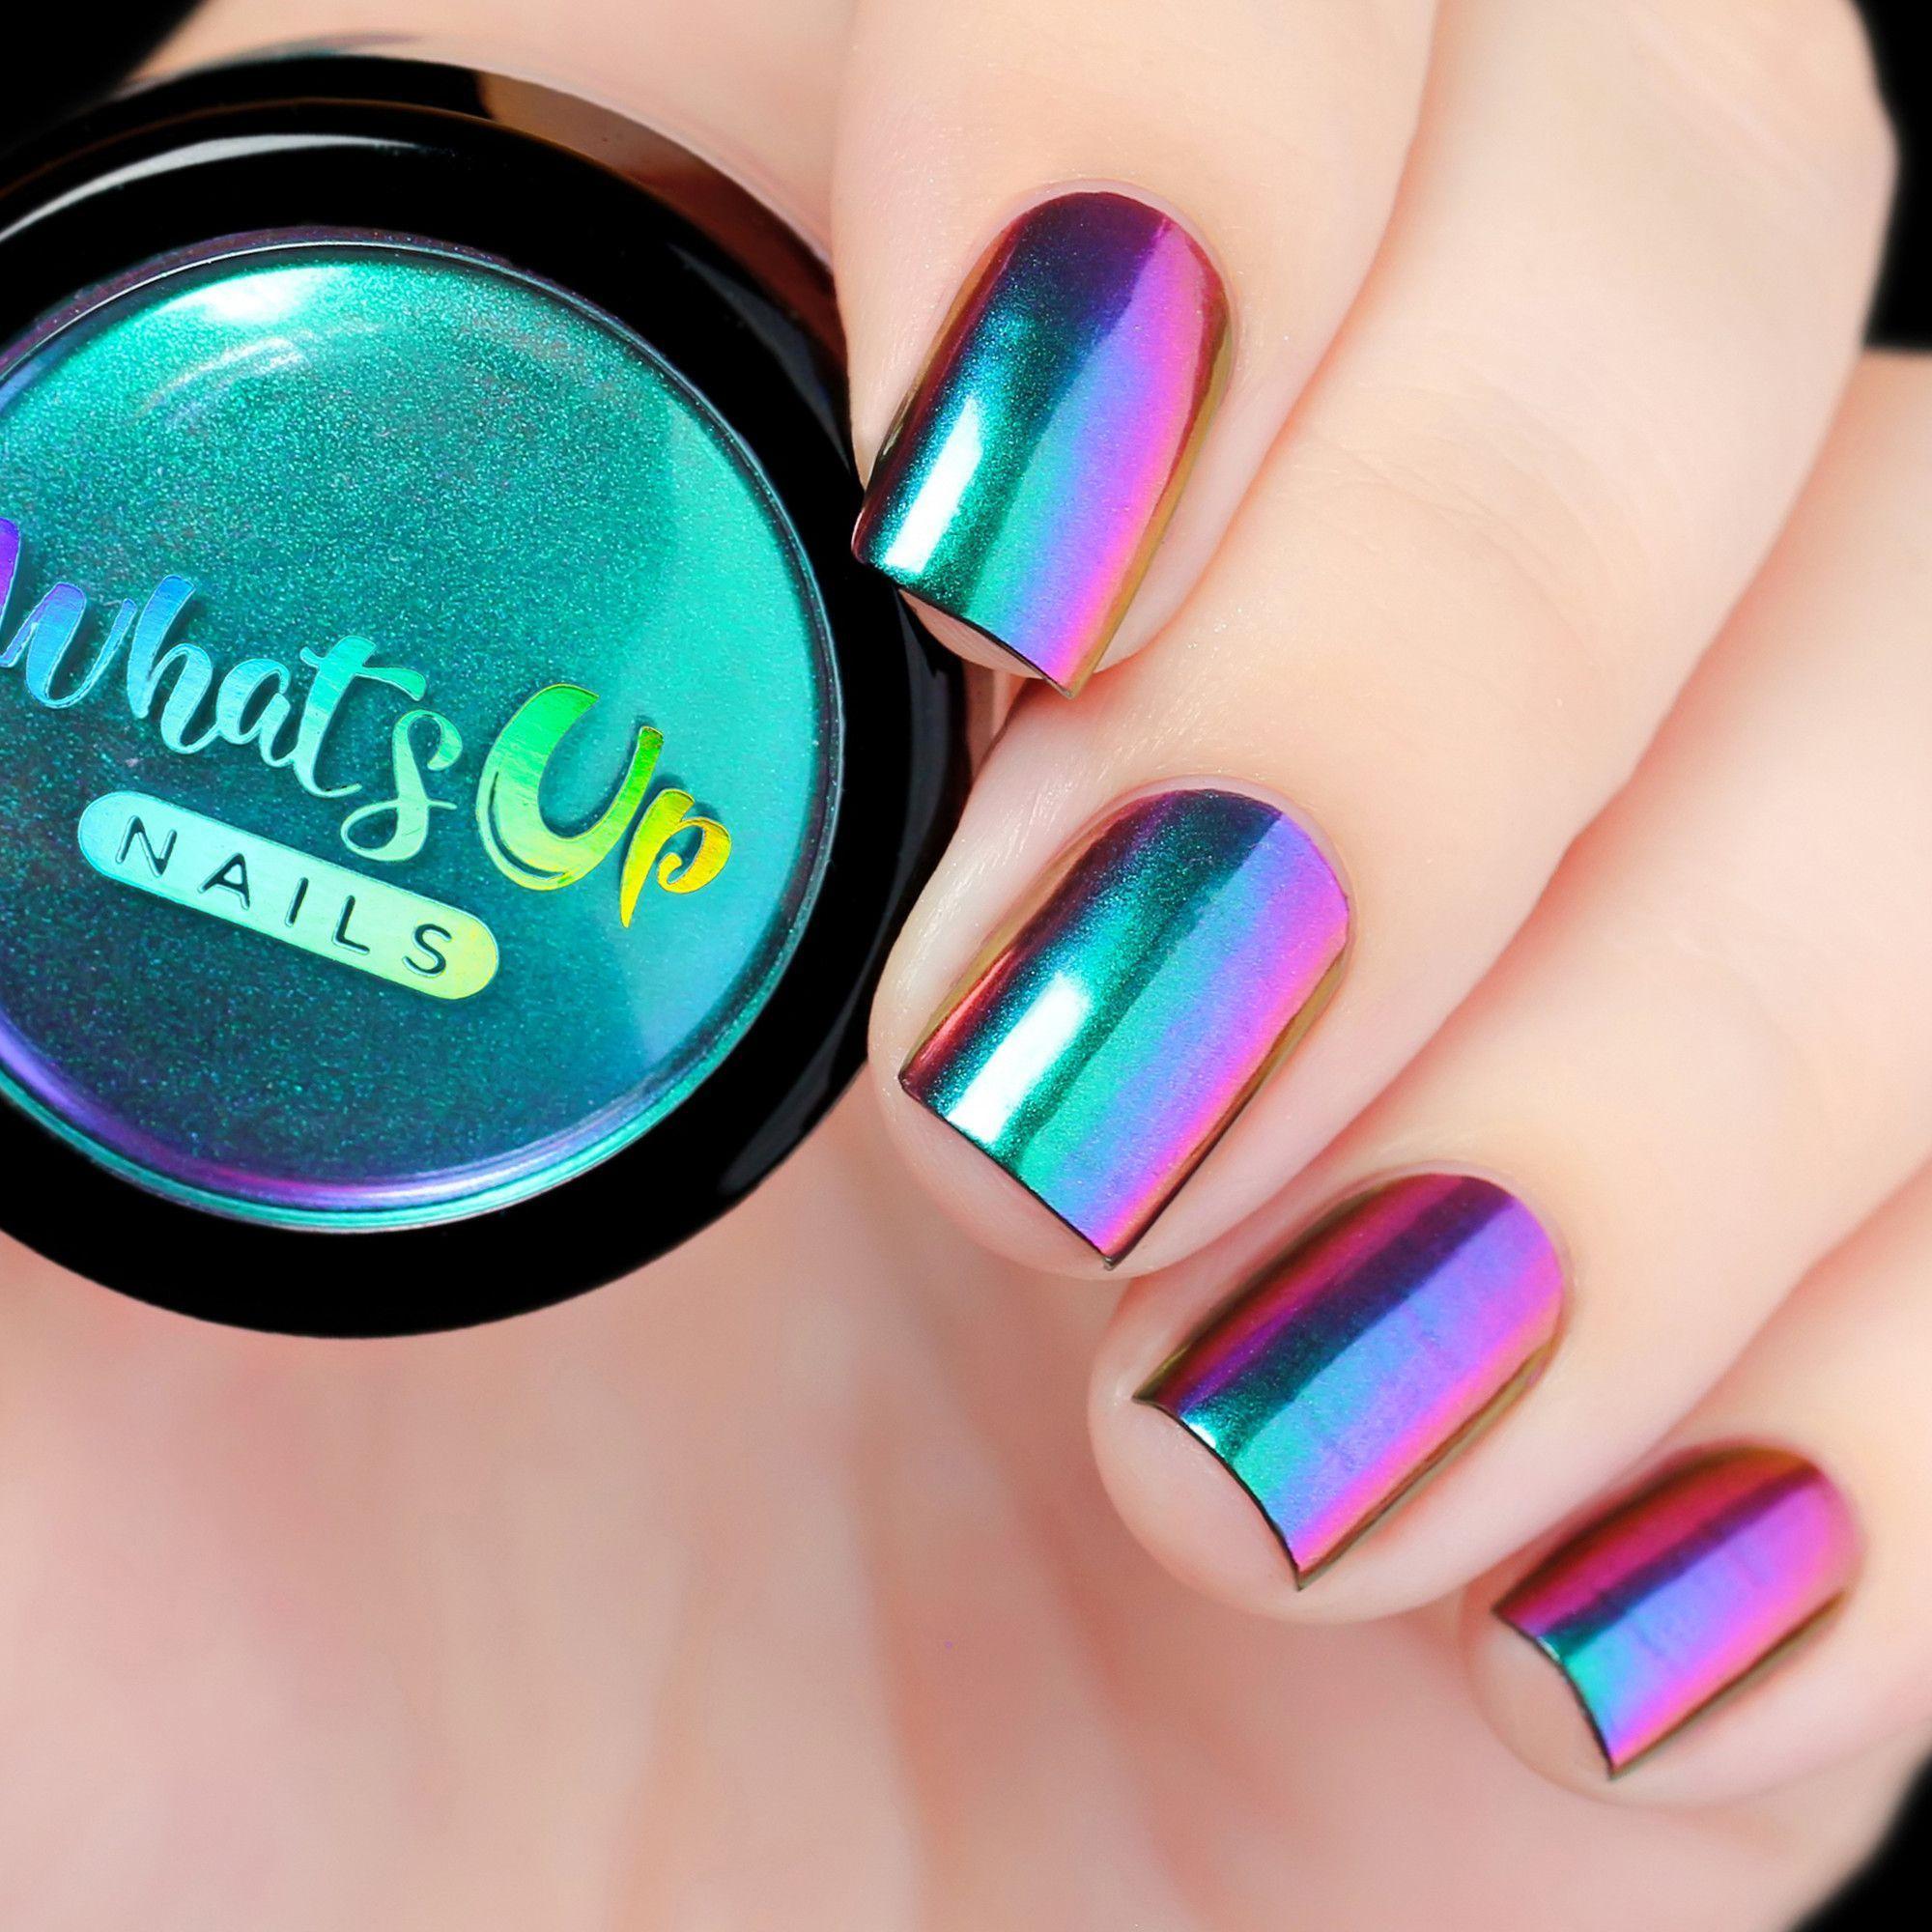 Whats Up Nails - Paradise Powder | Nails Art | Pinterest | Paradise ...